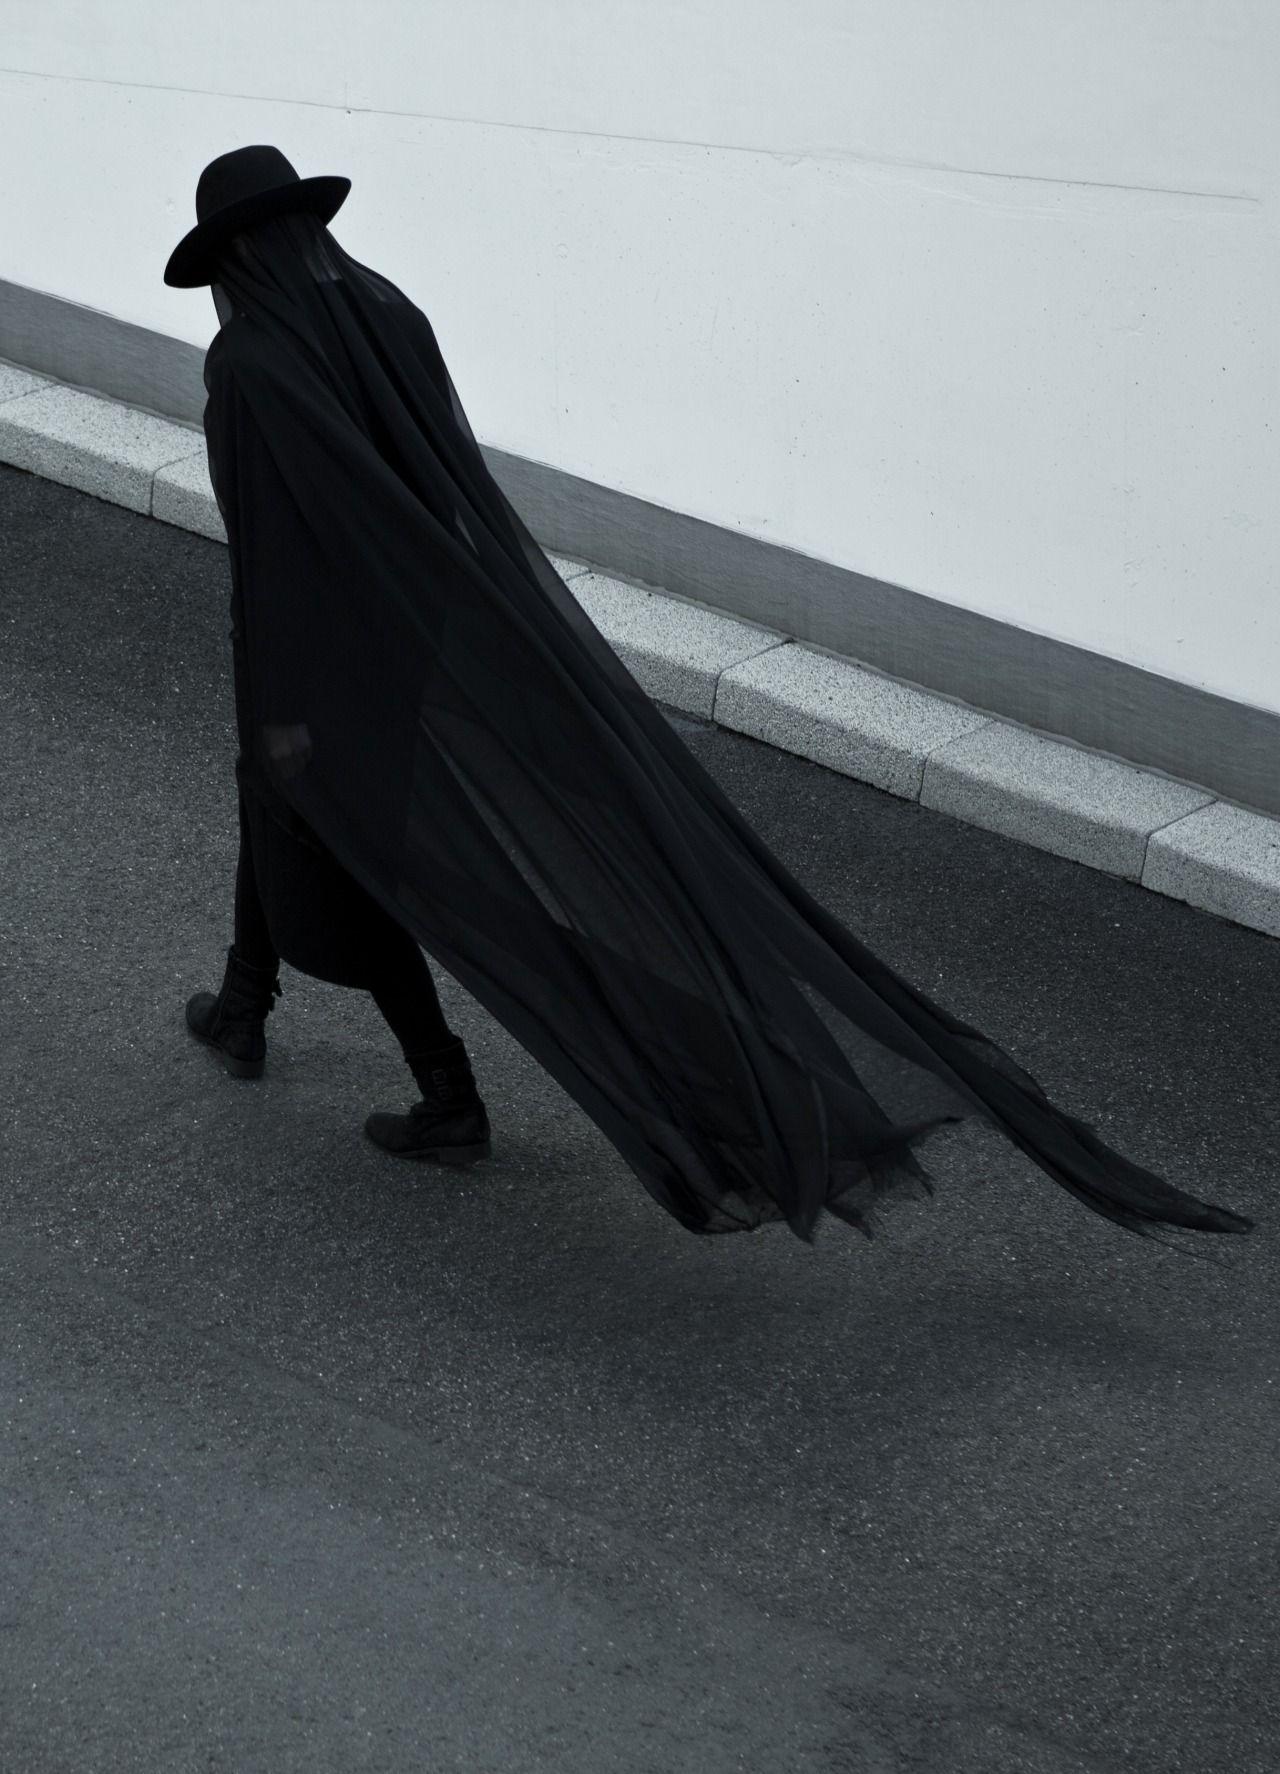 Drape cape gothluxe avantegarde fashion moda Él pinterest